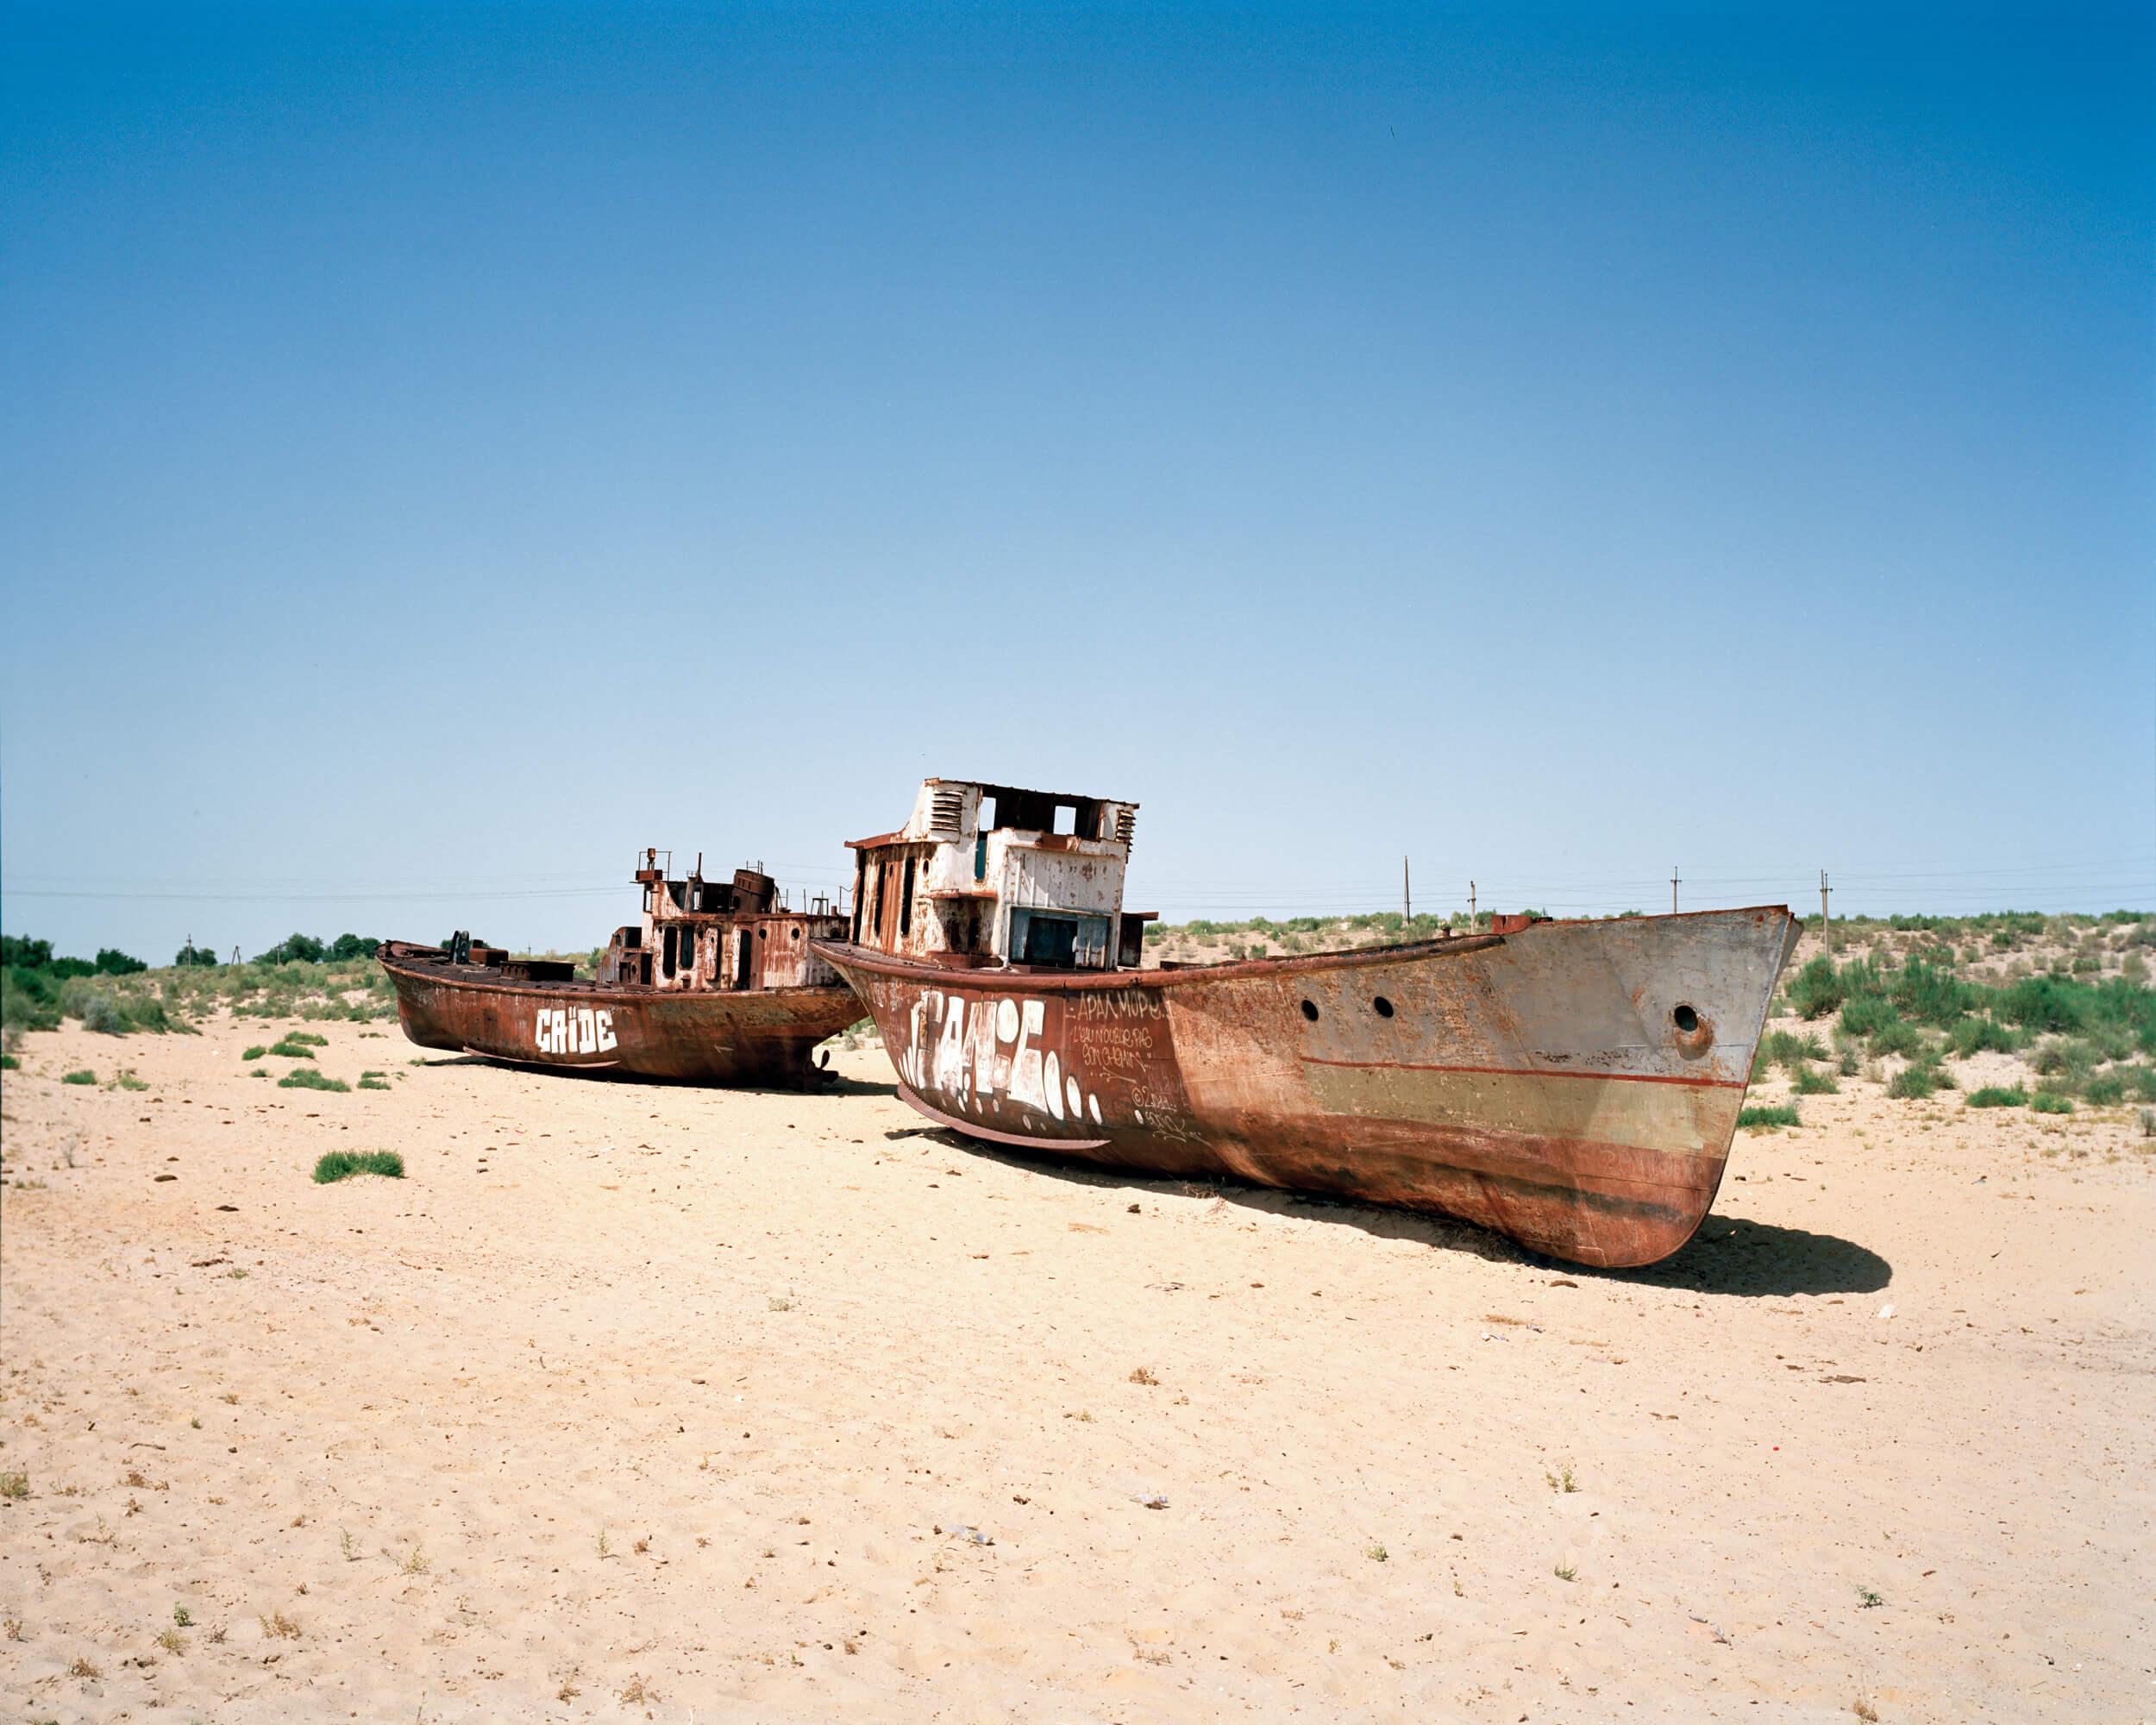 marco-barbieri-water-in-the-desert-3.jpg